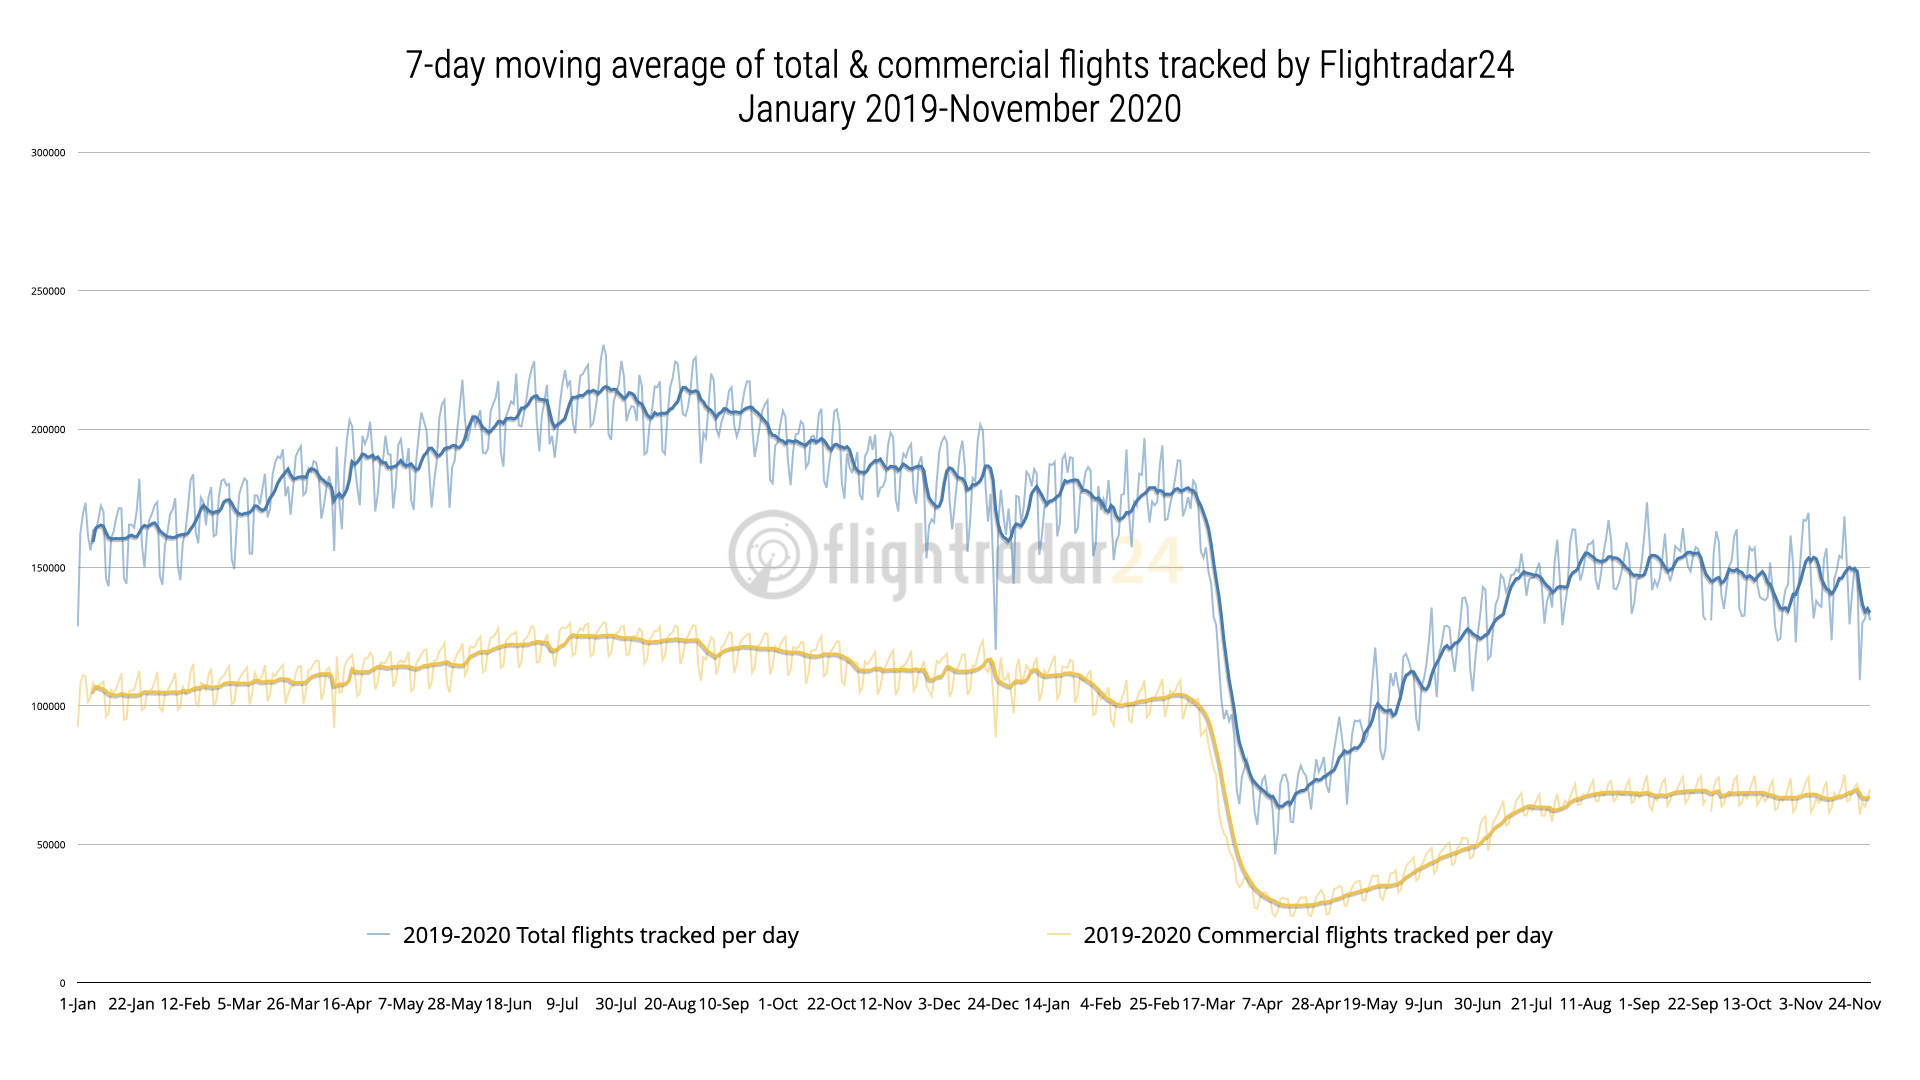 Jan 2019-November 2020 Total and Commercial Flights